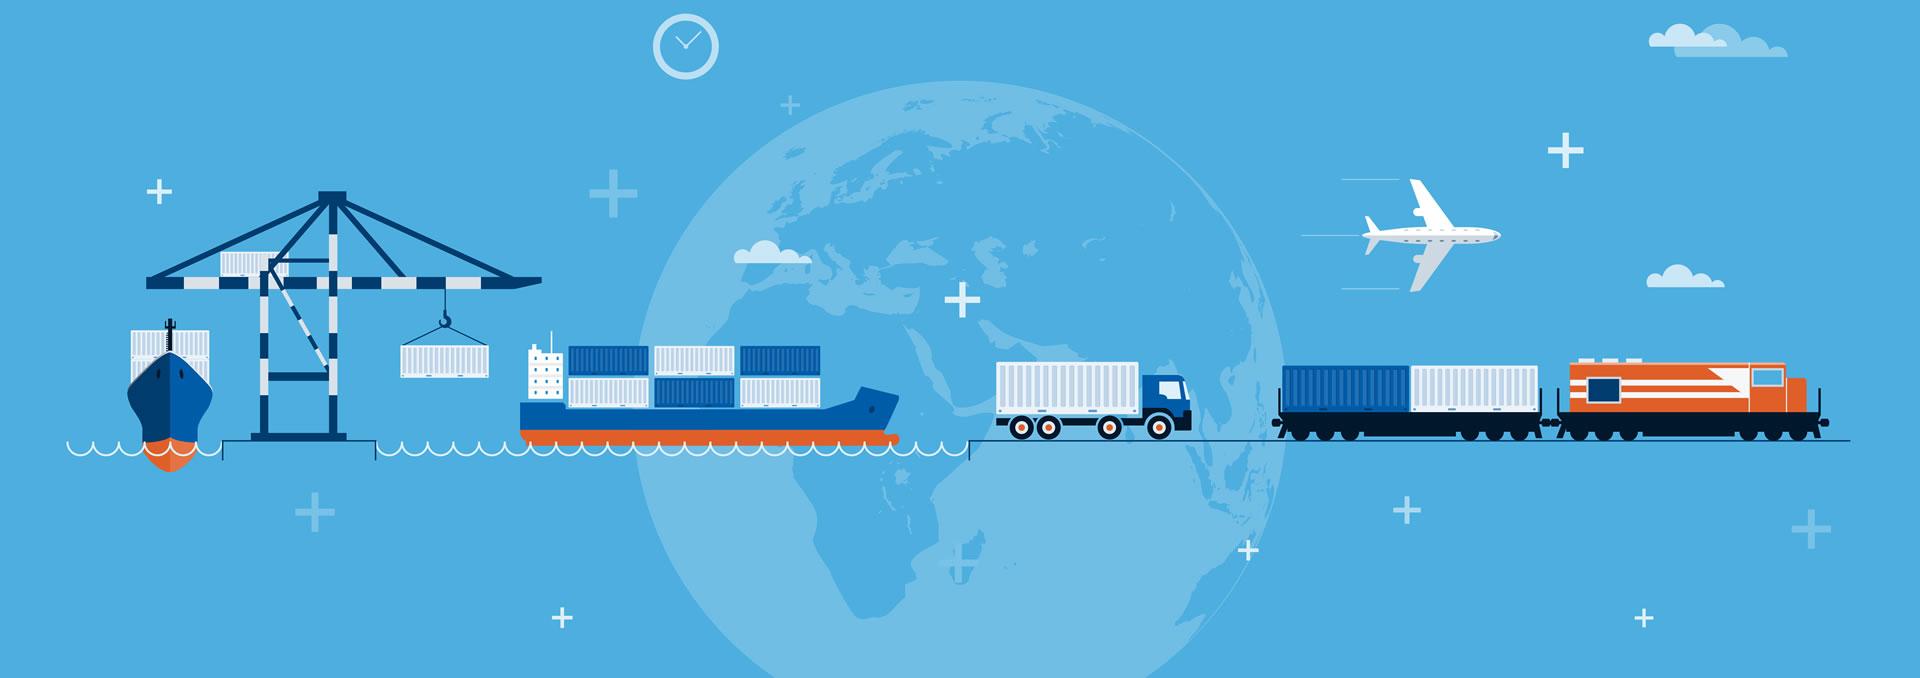 Comercio exterior argentina blog el insignia for Comercio exterior